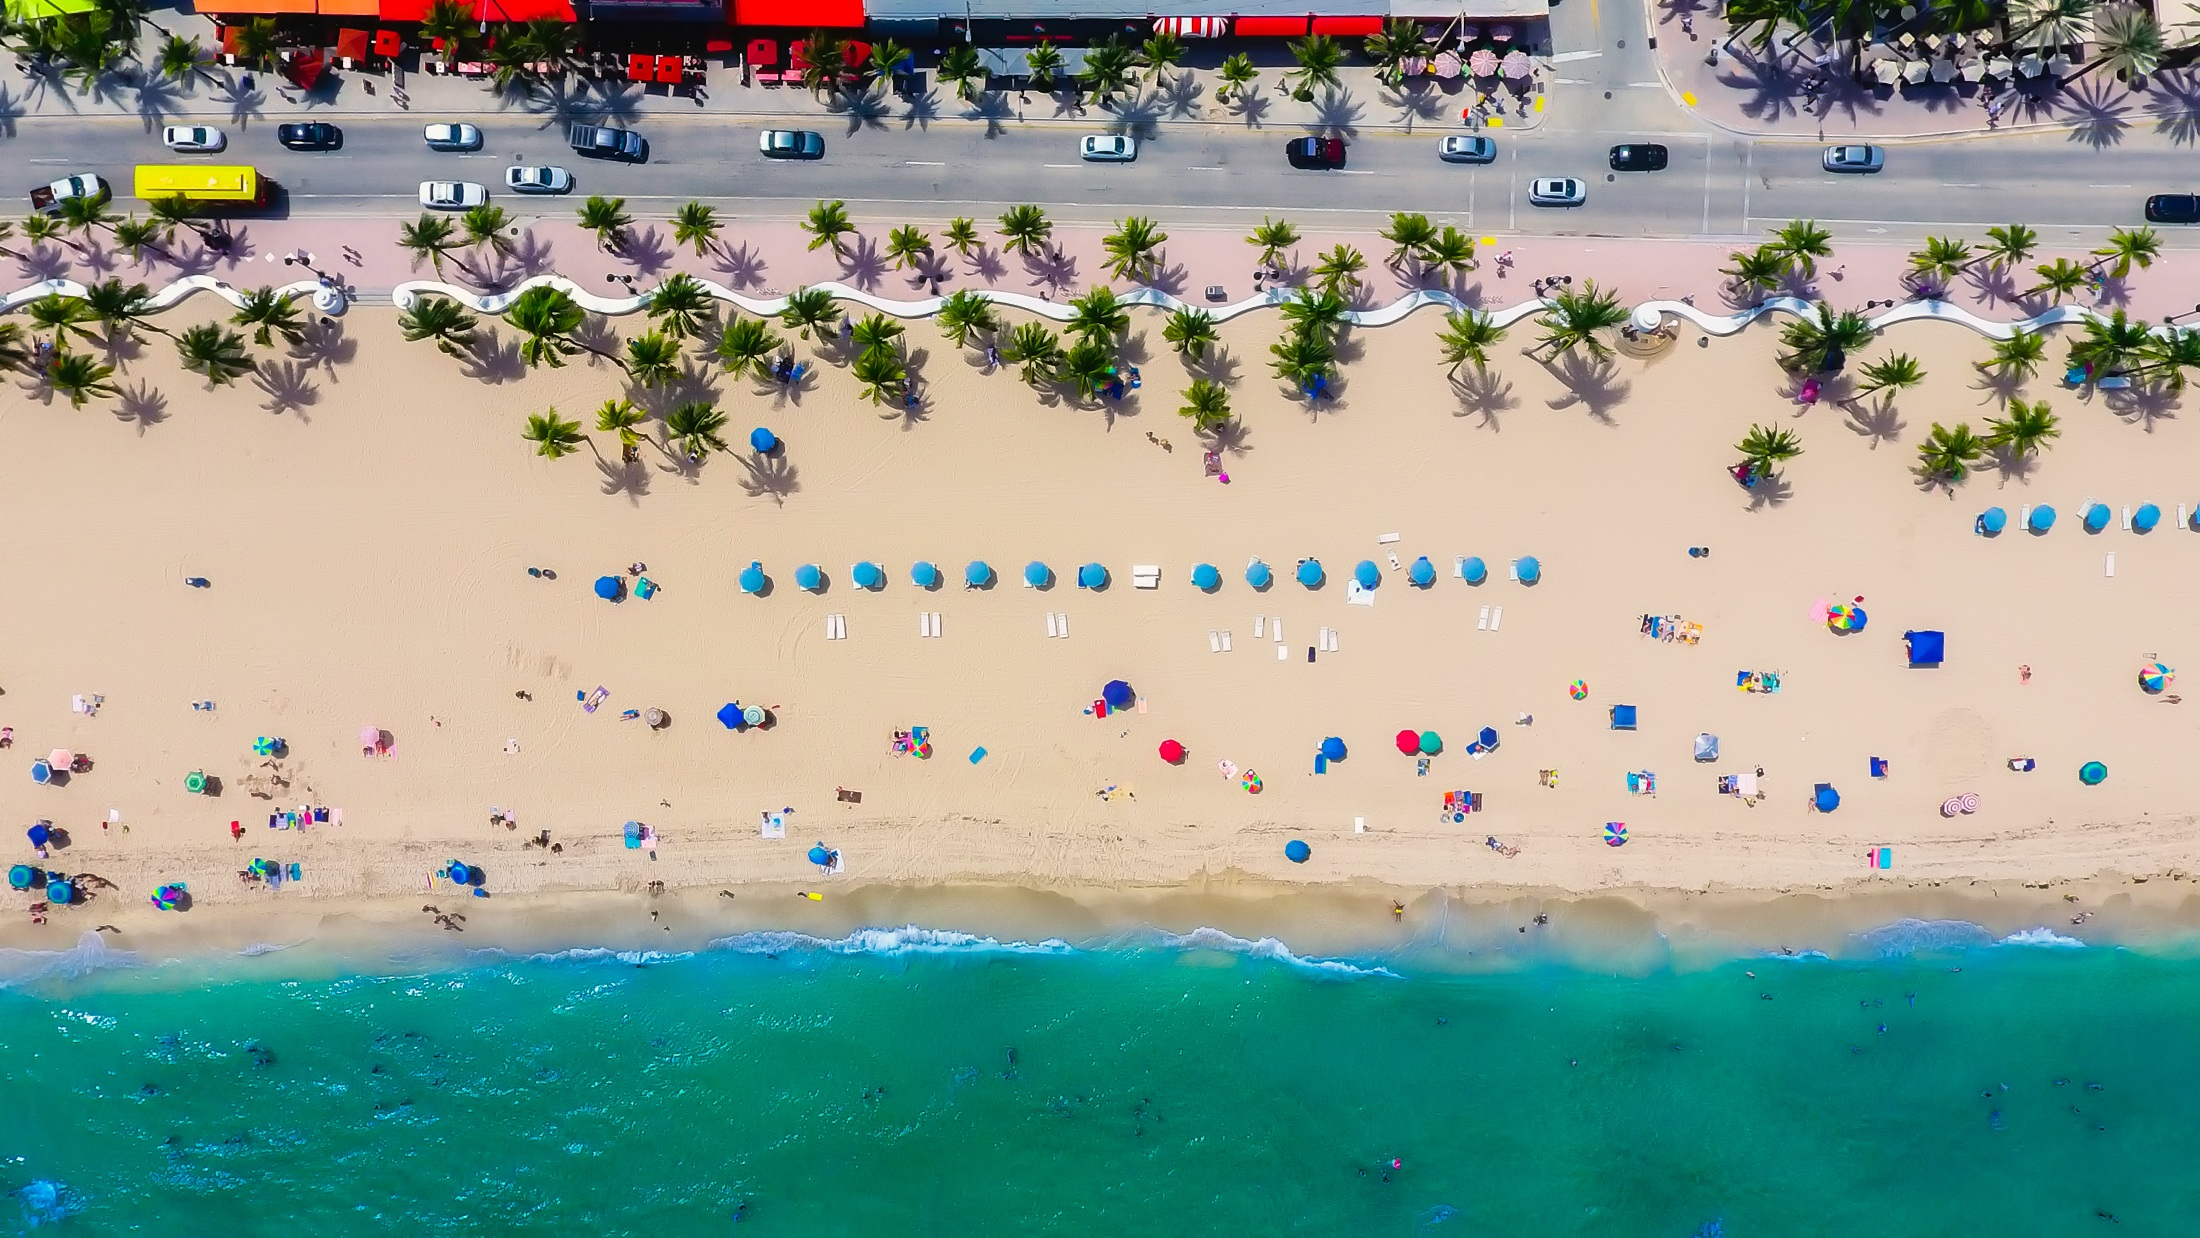 Florida slot machine casino gambling: Fort Lauderdale, Florida